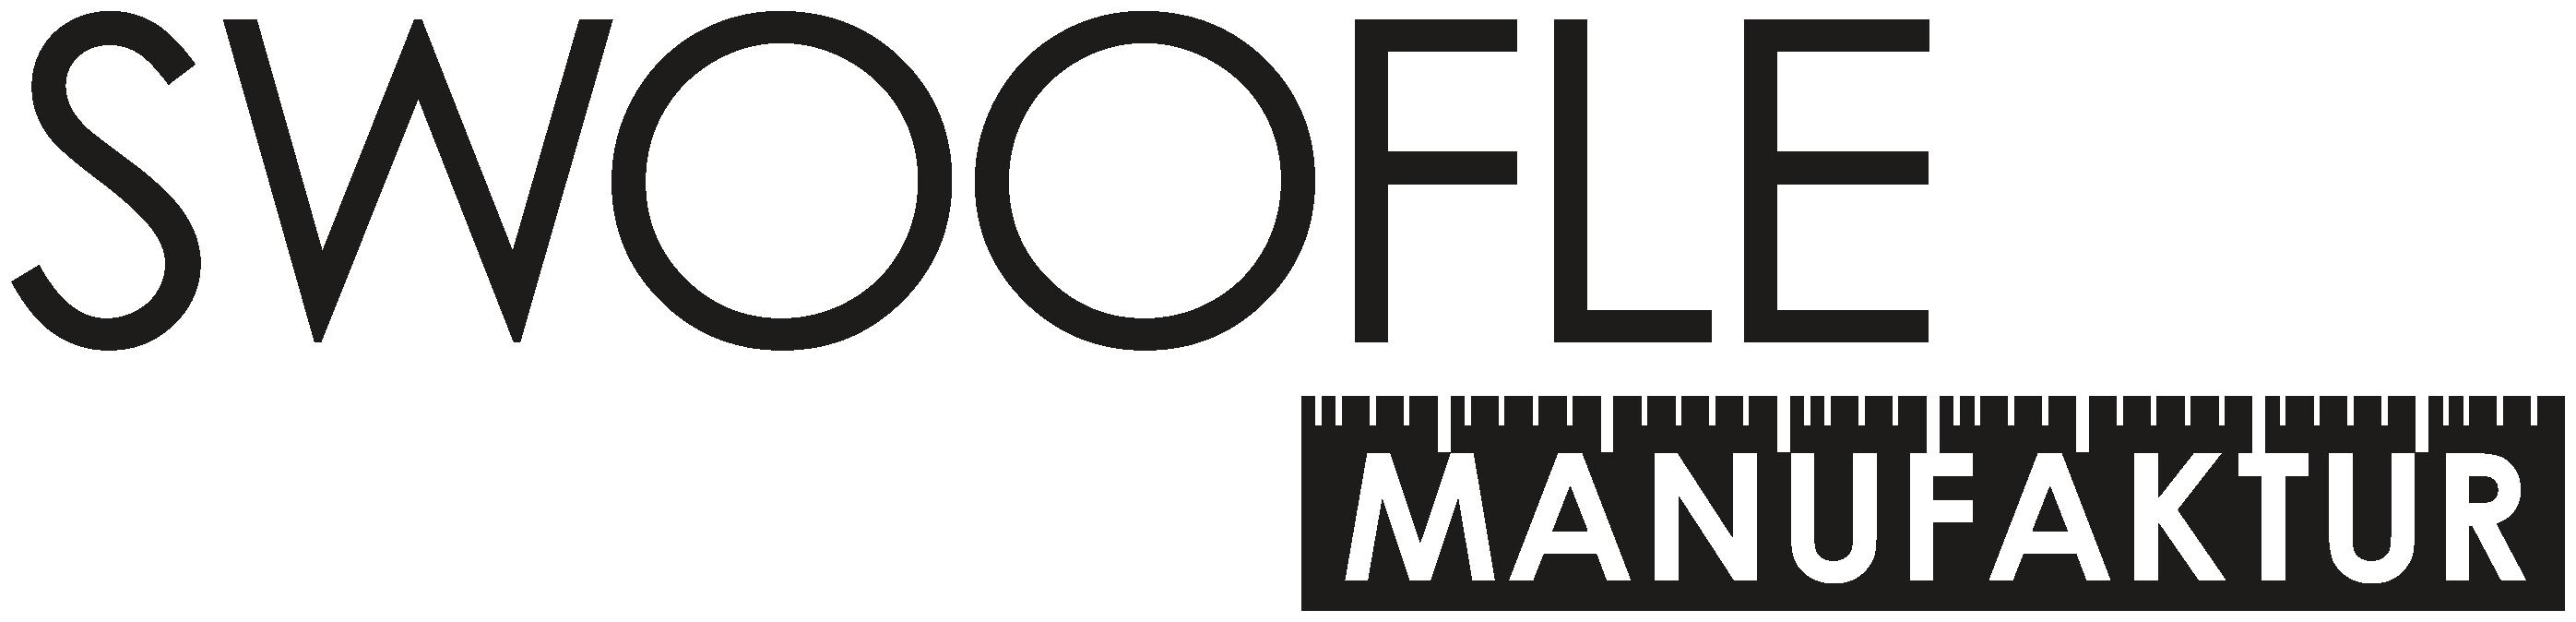 Logo der SWOOFLE GmbH